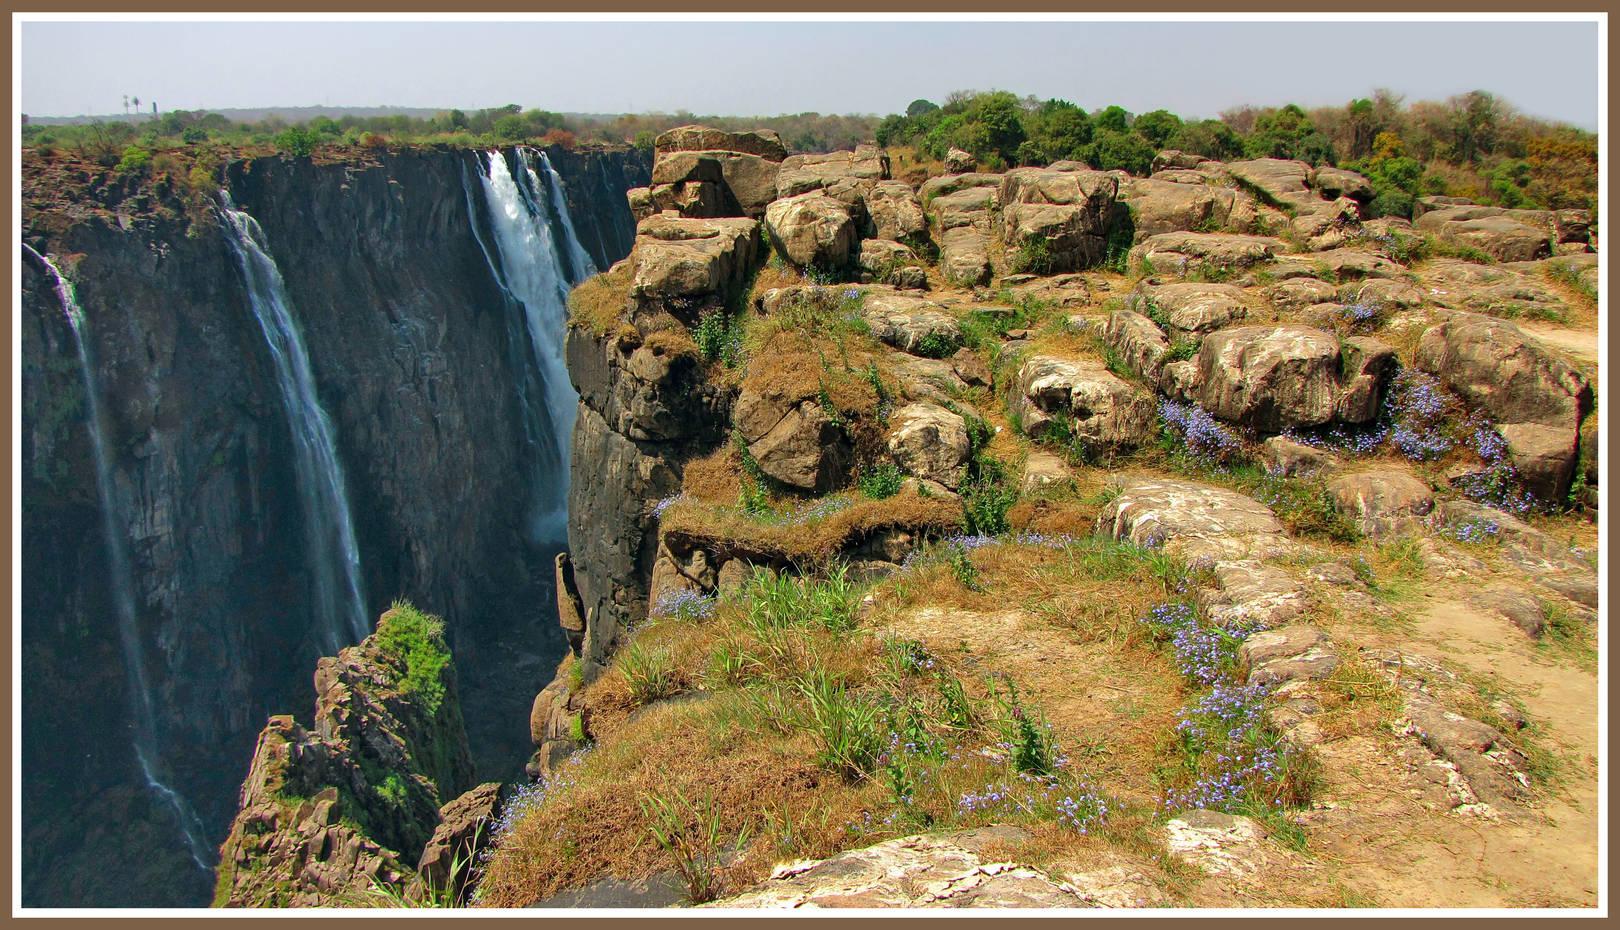 Замбия и Зимбабве (Zambia and Zimbabwe)